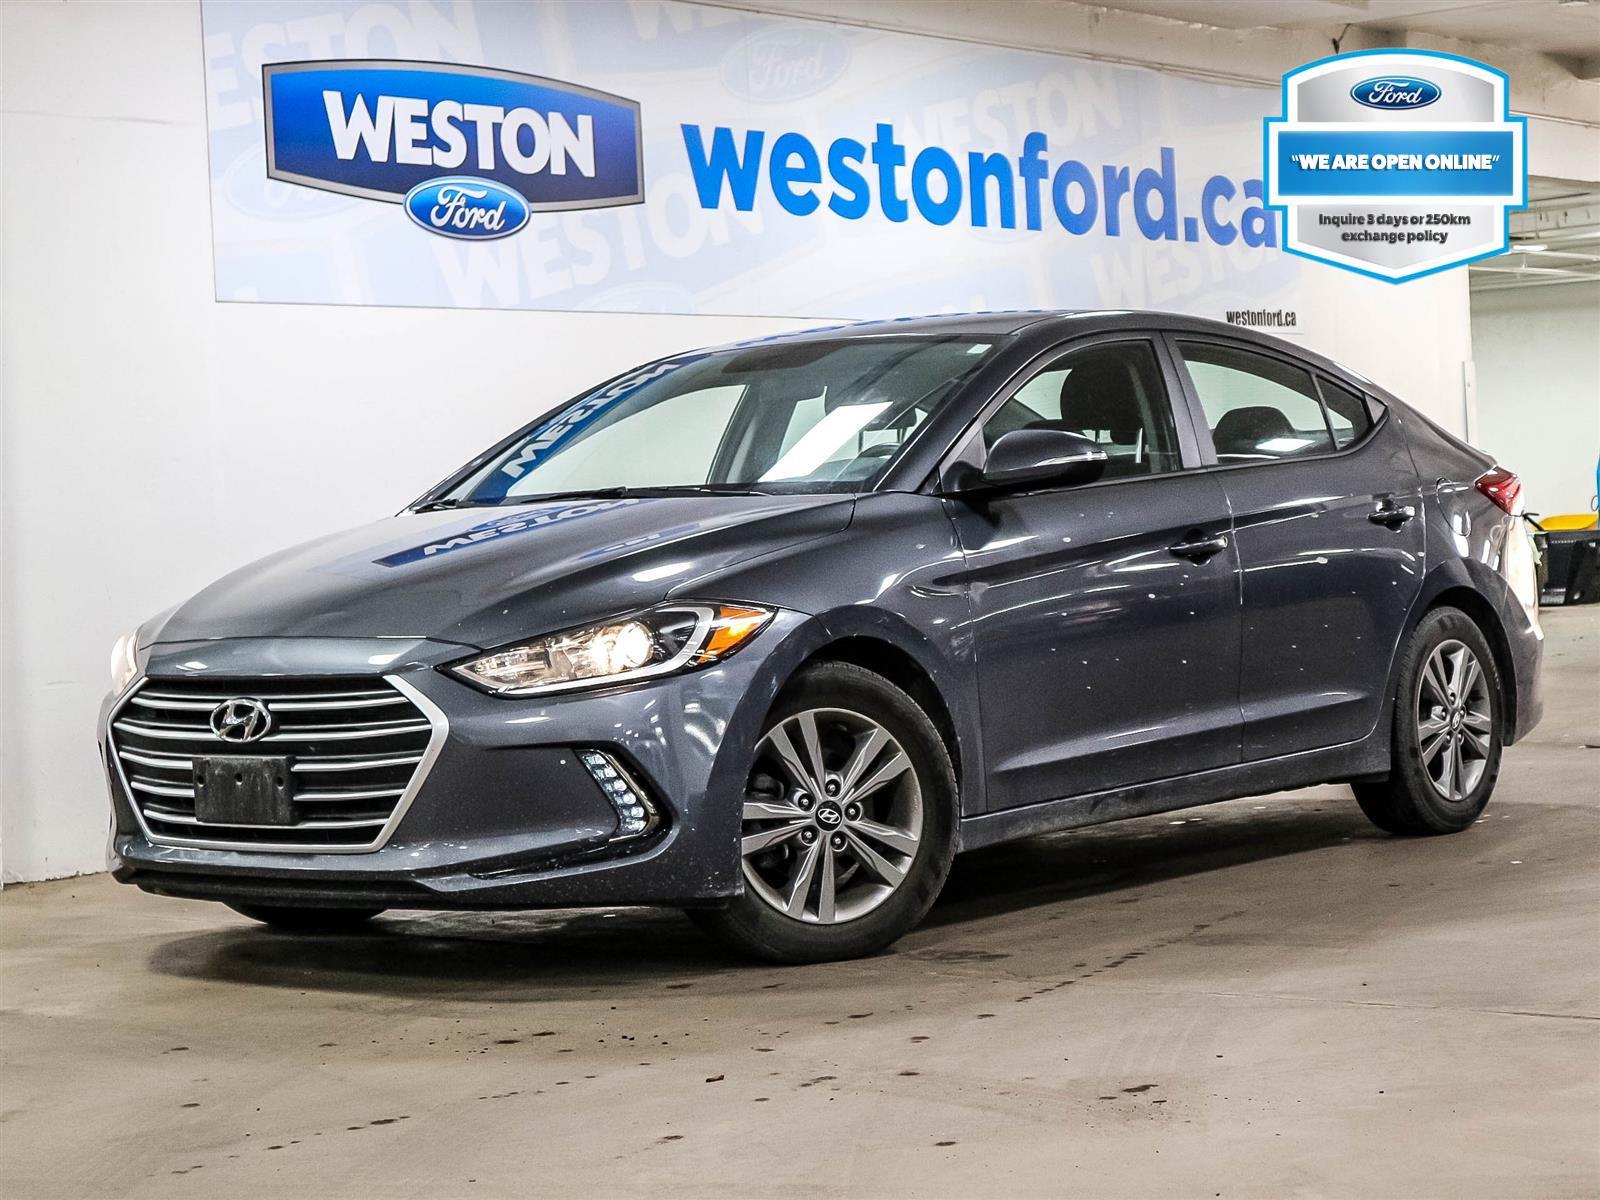 used 2018 Hyundai Elantra car, priced at $17,988